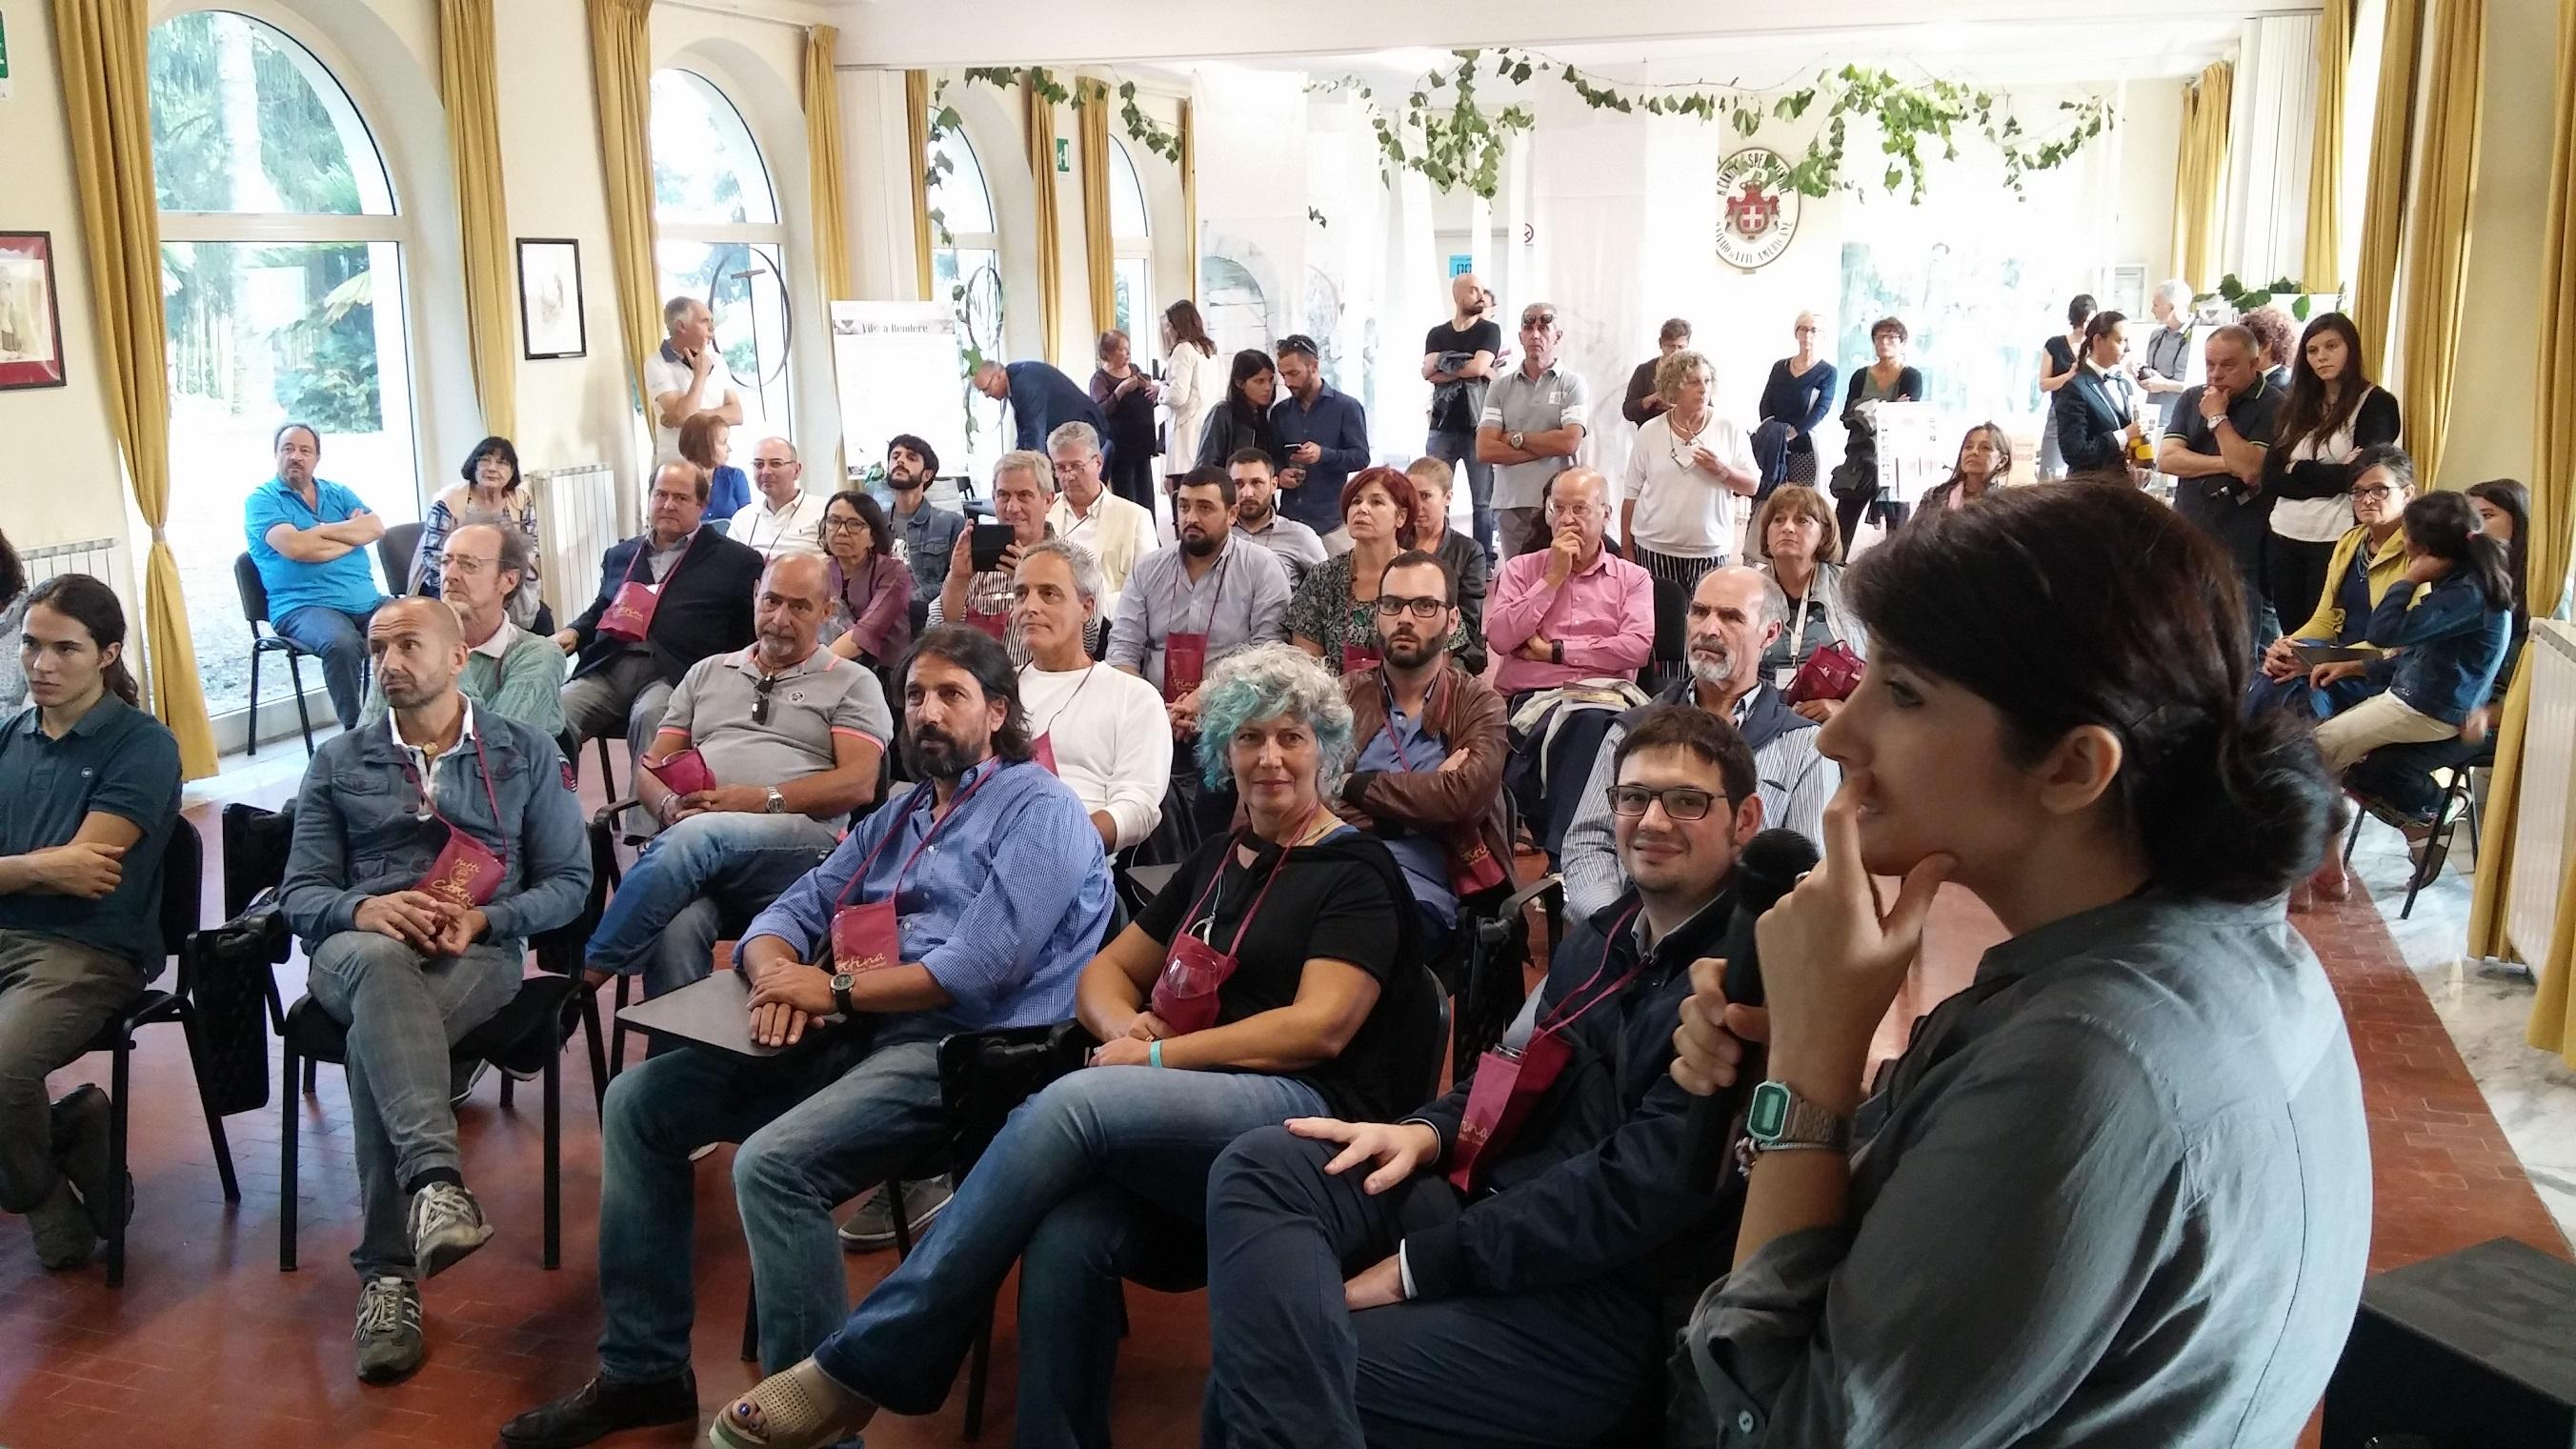 http://ideeinfermento.it/wp/wp-content/uploads/2017/05/Tutti-giù-in-cantina-9-Enoconferenza-di-Claudia-Giuliani.jpg